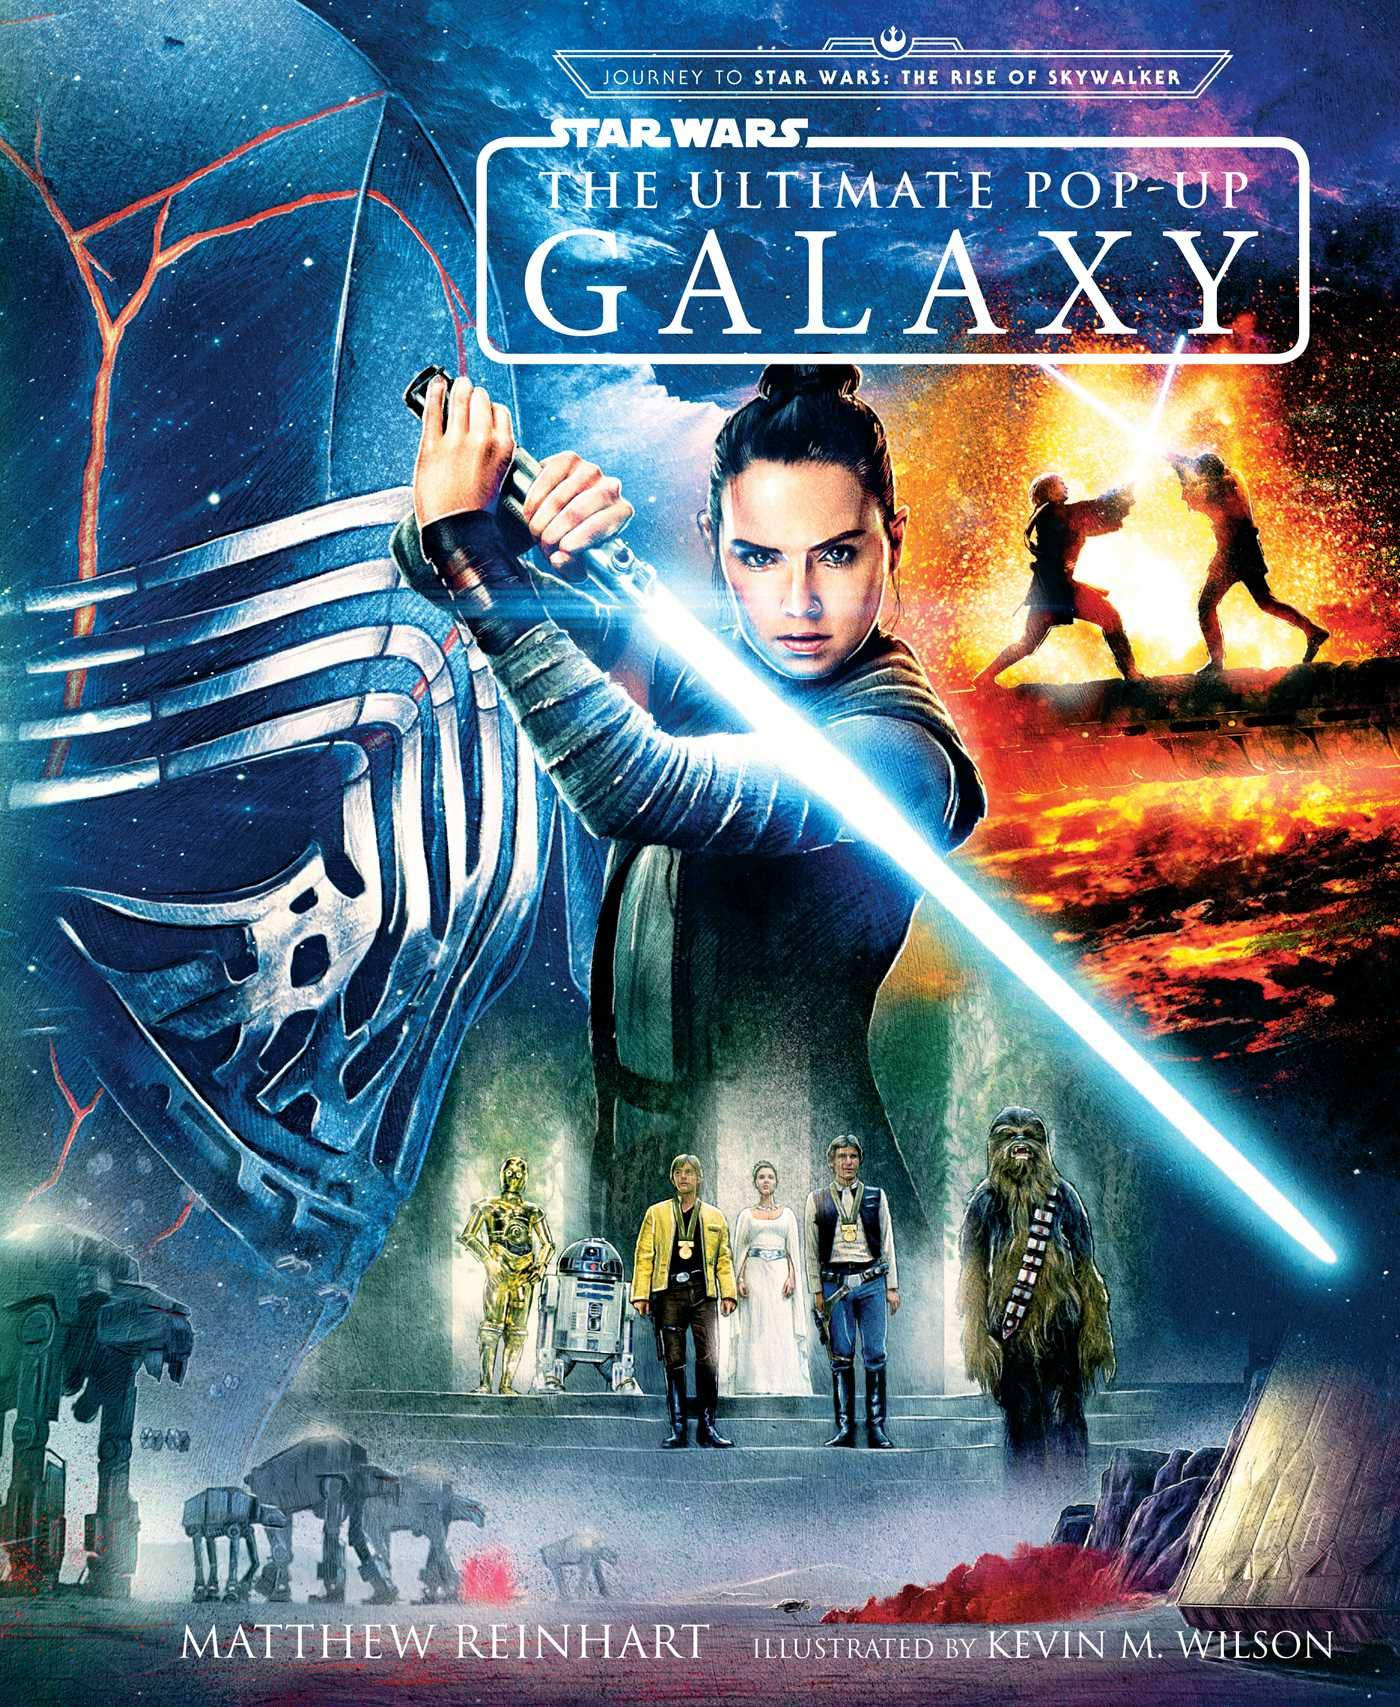 Звёздные войны: Абсолютная галактика-раскладушка